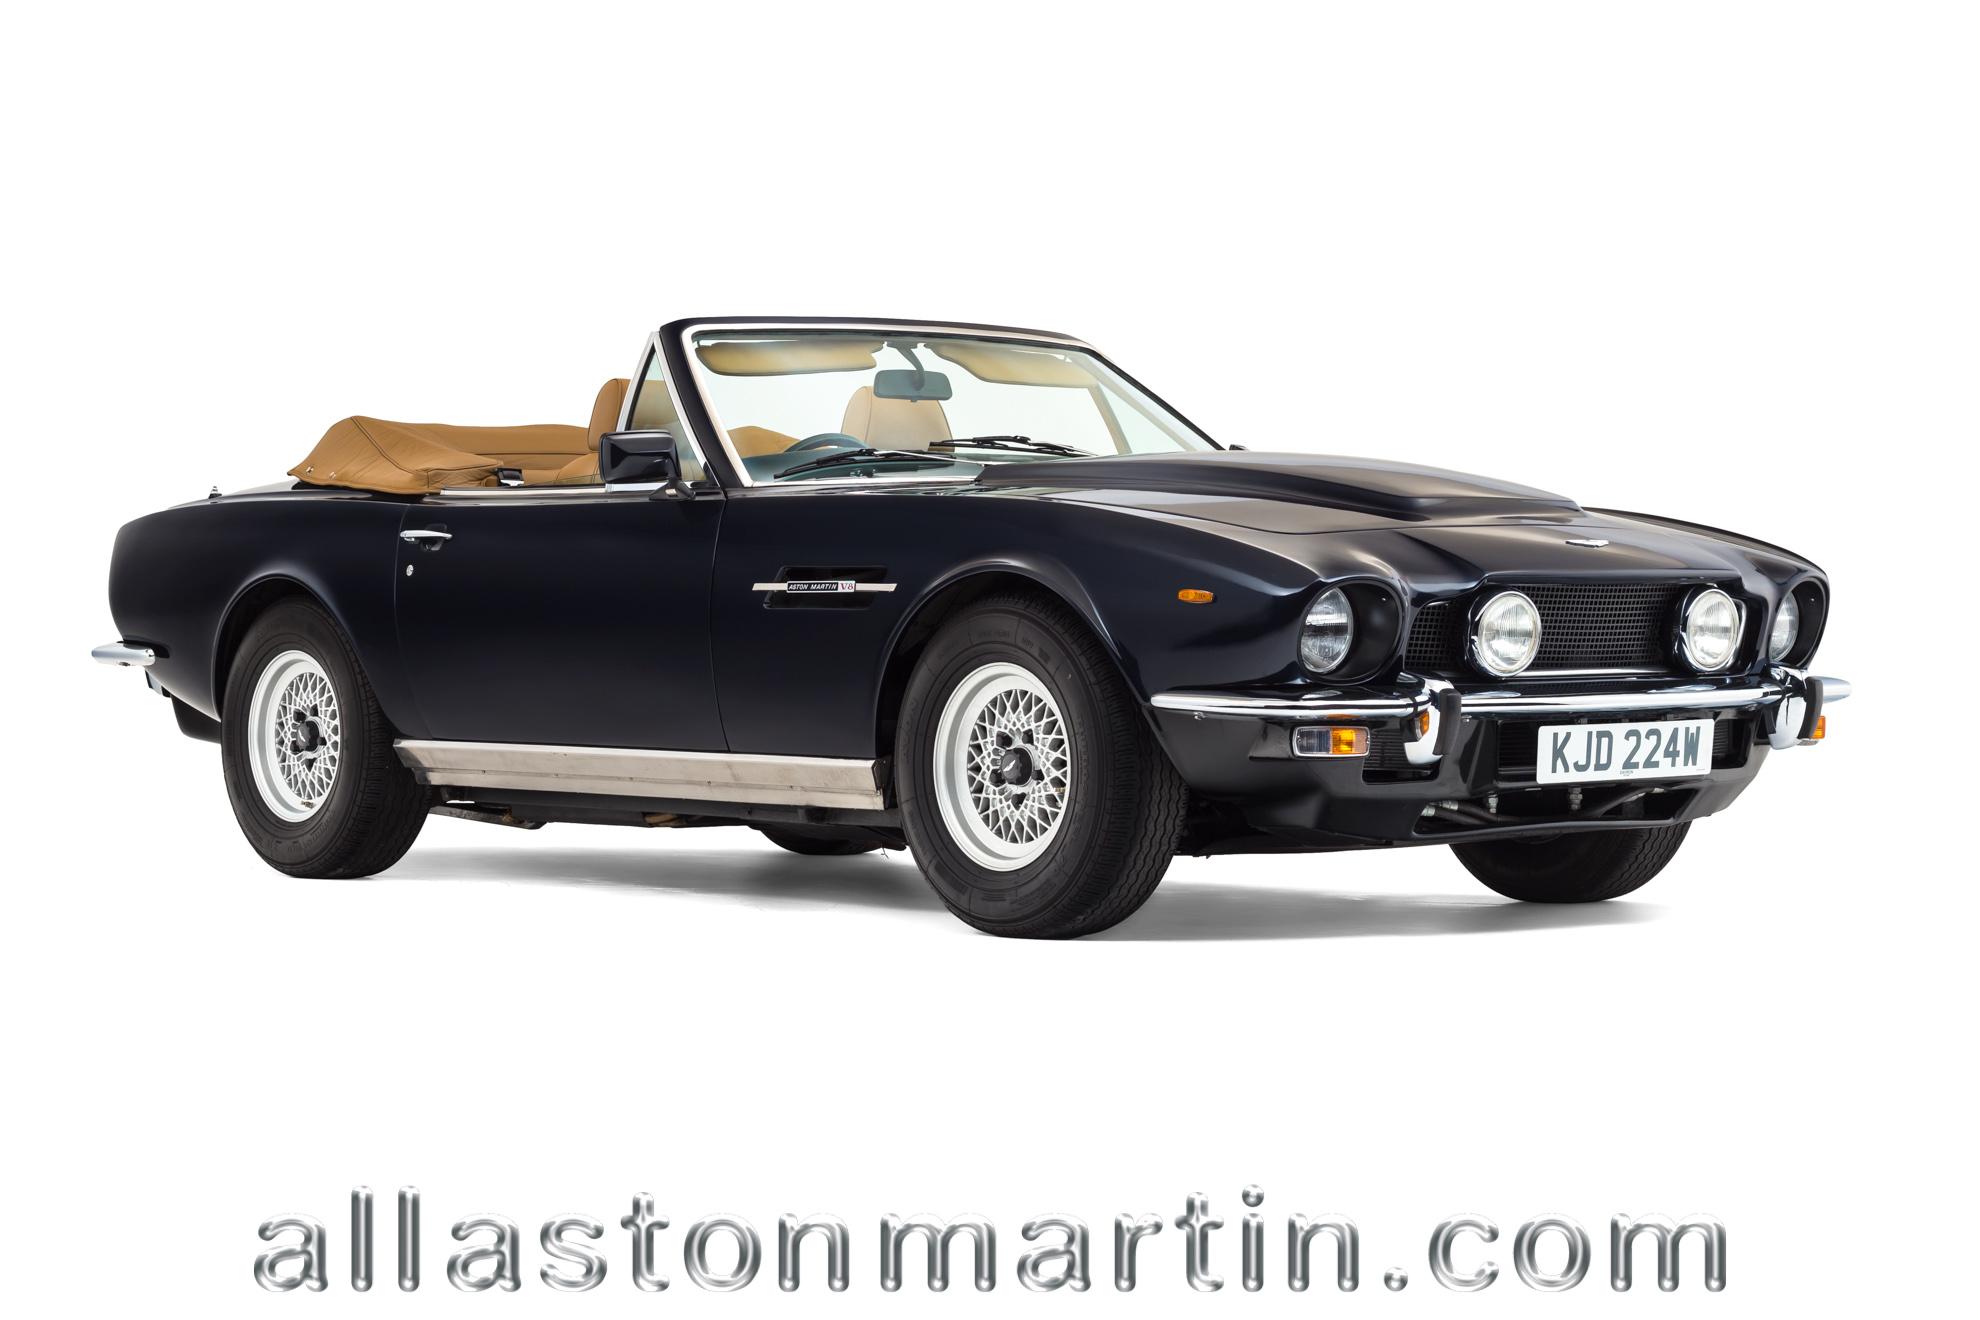 Aston Martin Cars For Sale Buy Aston Martin Details All Aston - Buy aston martin